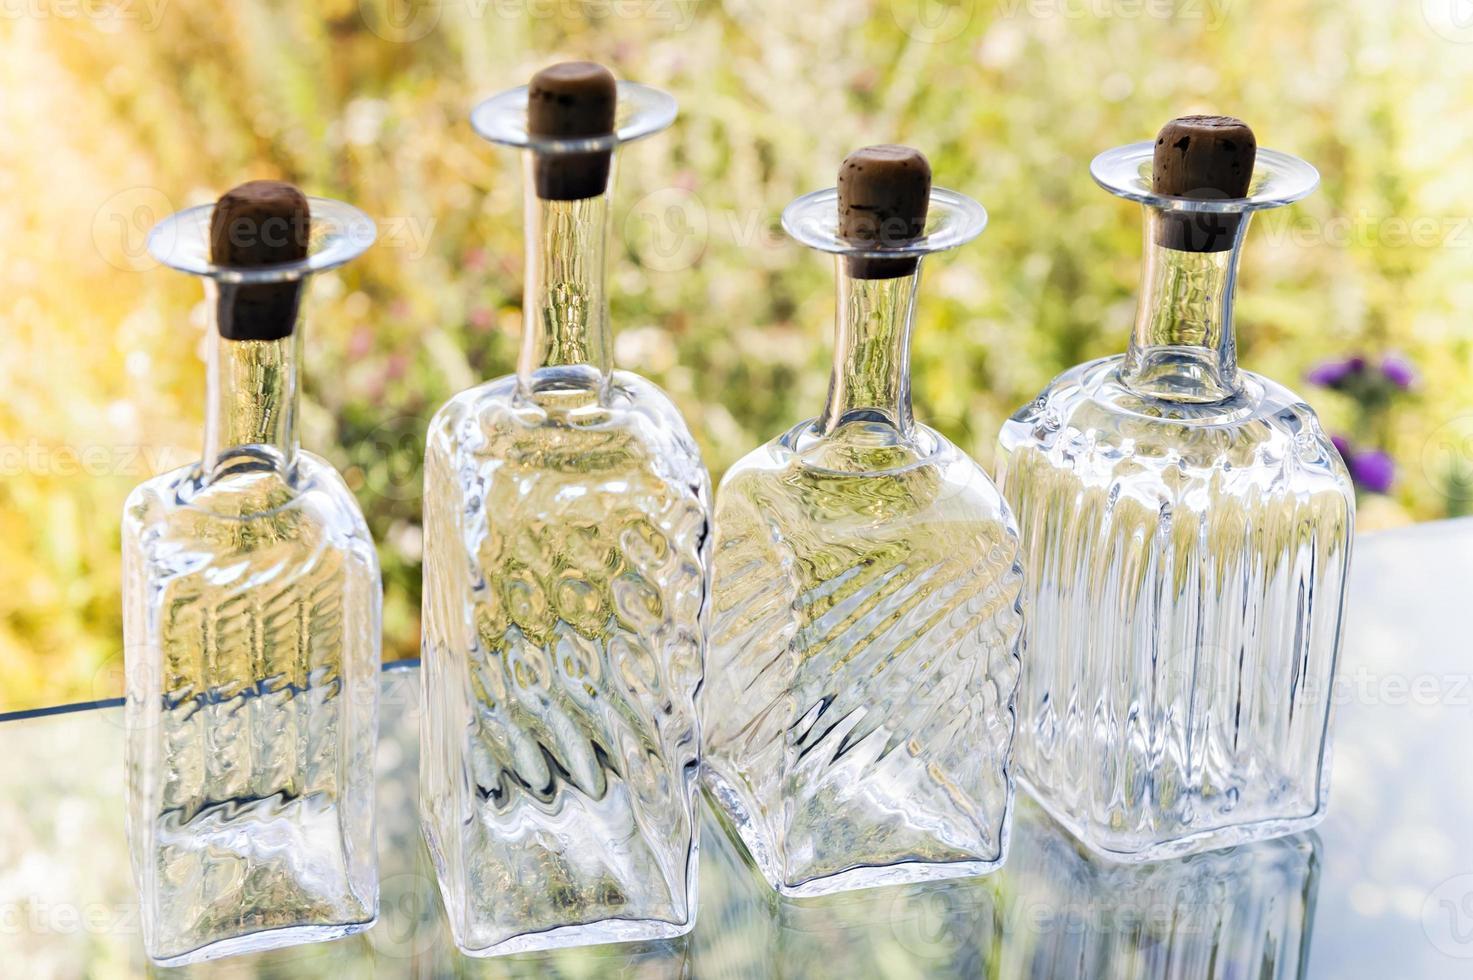 vier flessen met mooie helder glas op florale achtergrond. foto